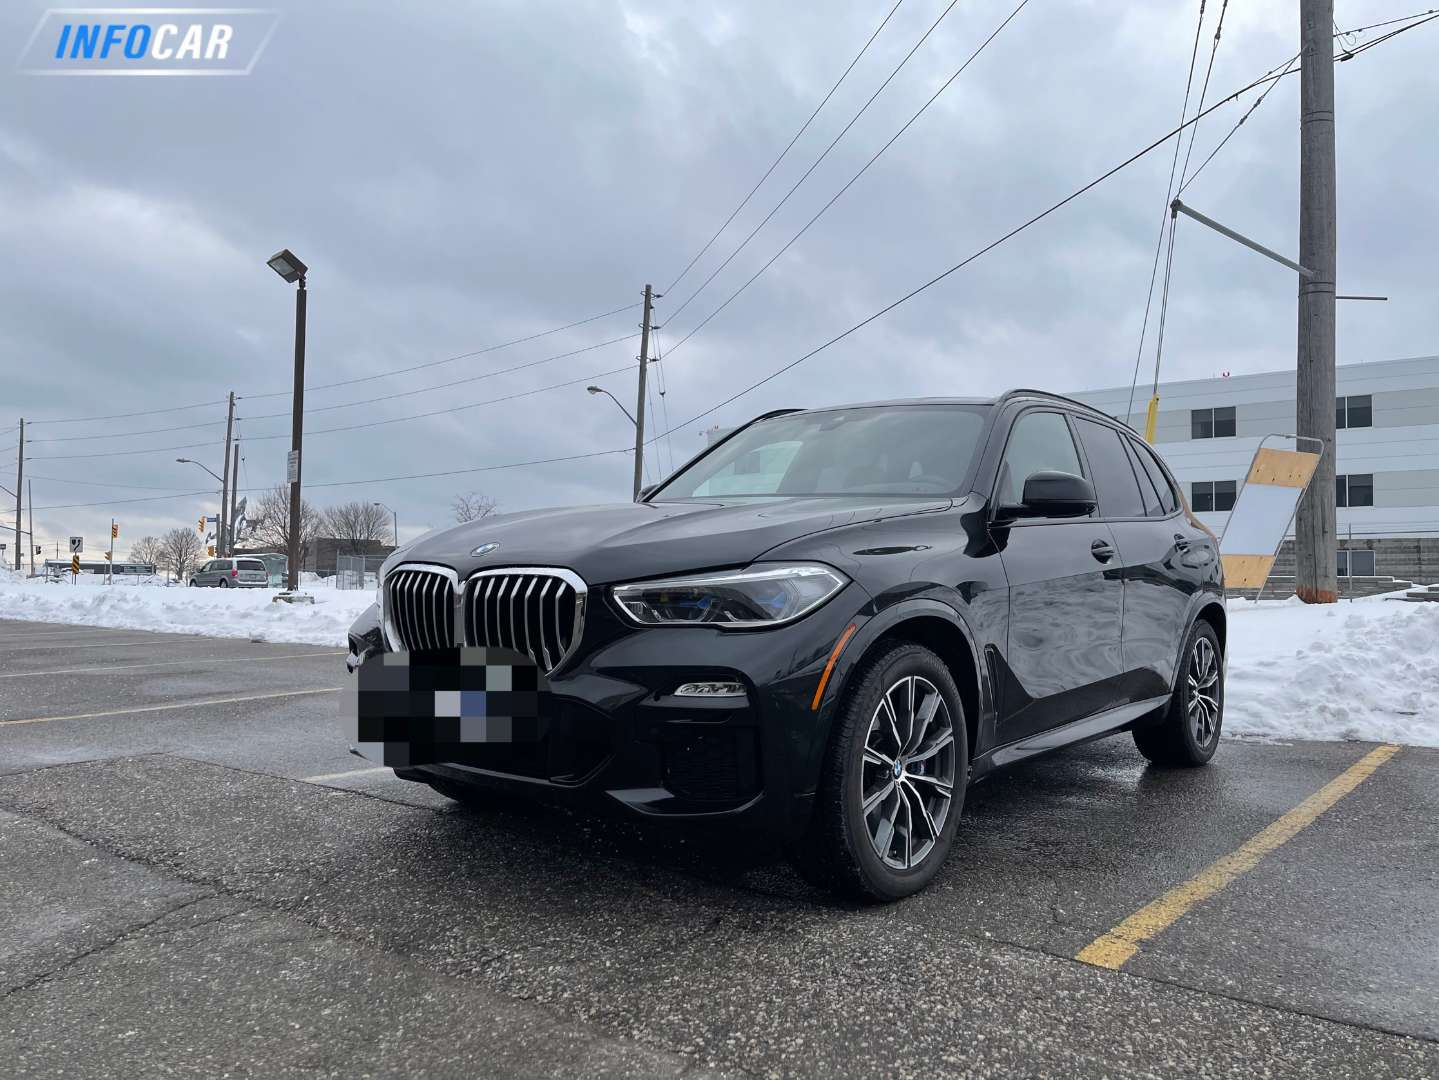 2020 BMW X5 Enhanced+M PKG - INFOCAR - Toronto's Most Comprehensive New and Used Auto Trading Platform